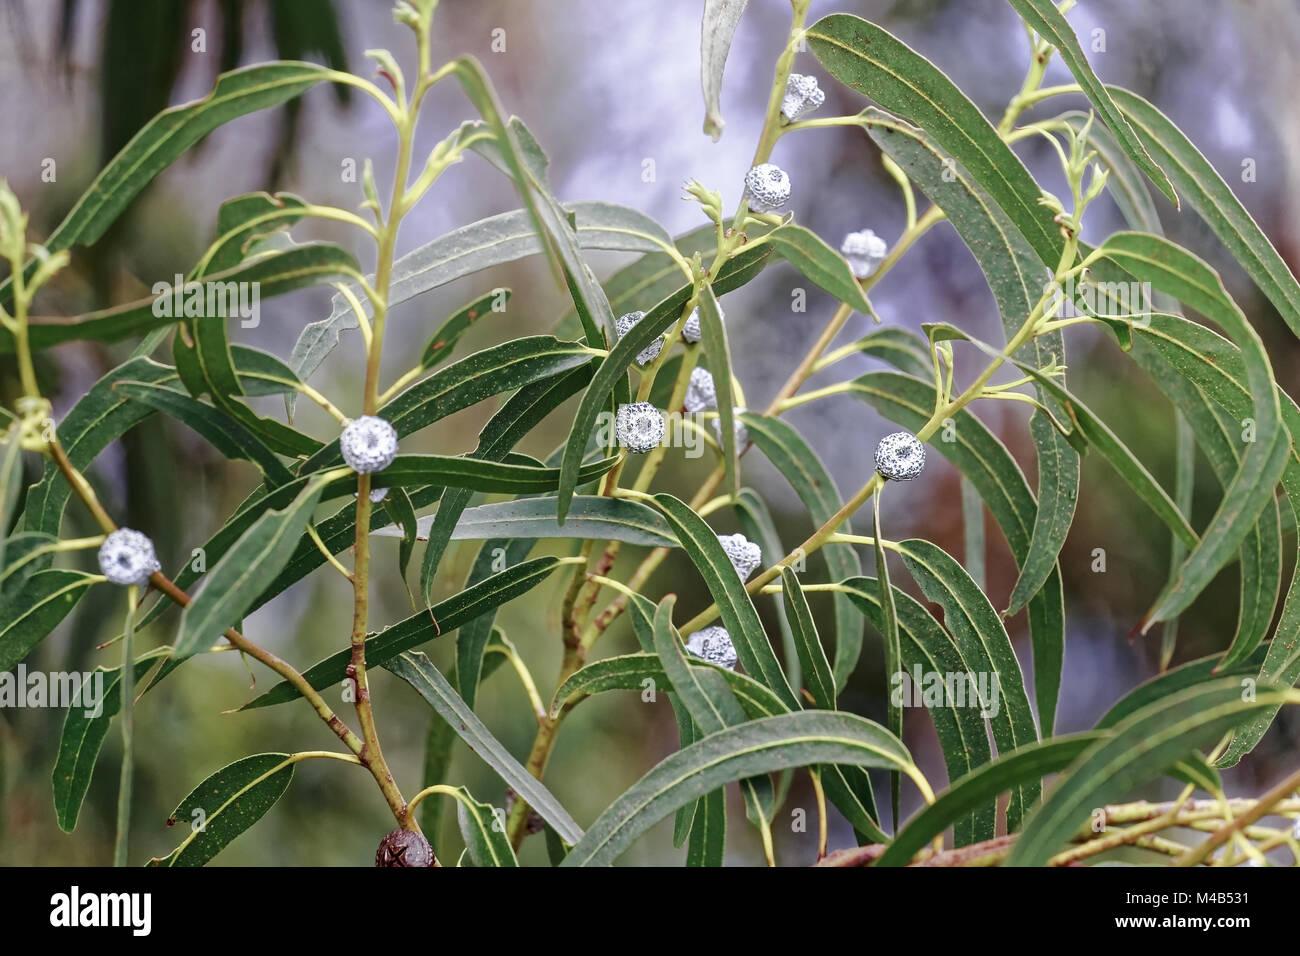 Eucalyptus, Eucalyptus globulus LABILLl, Australia - Stock Image